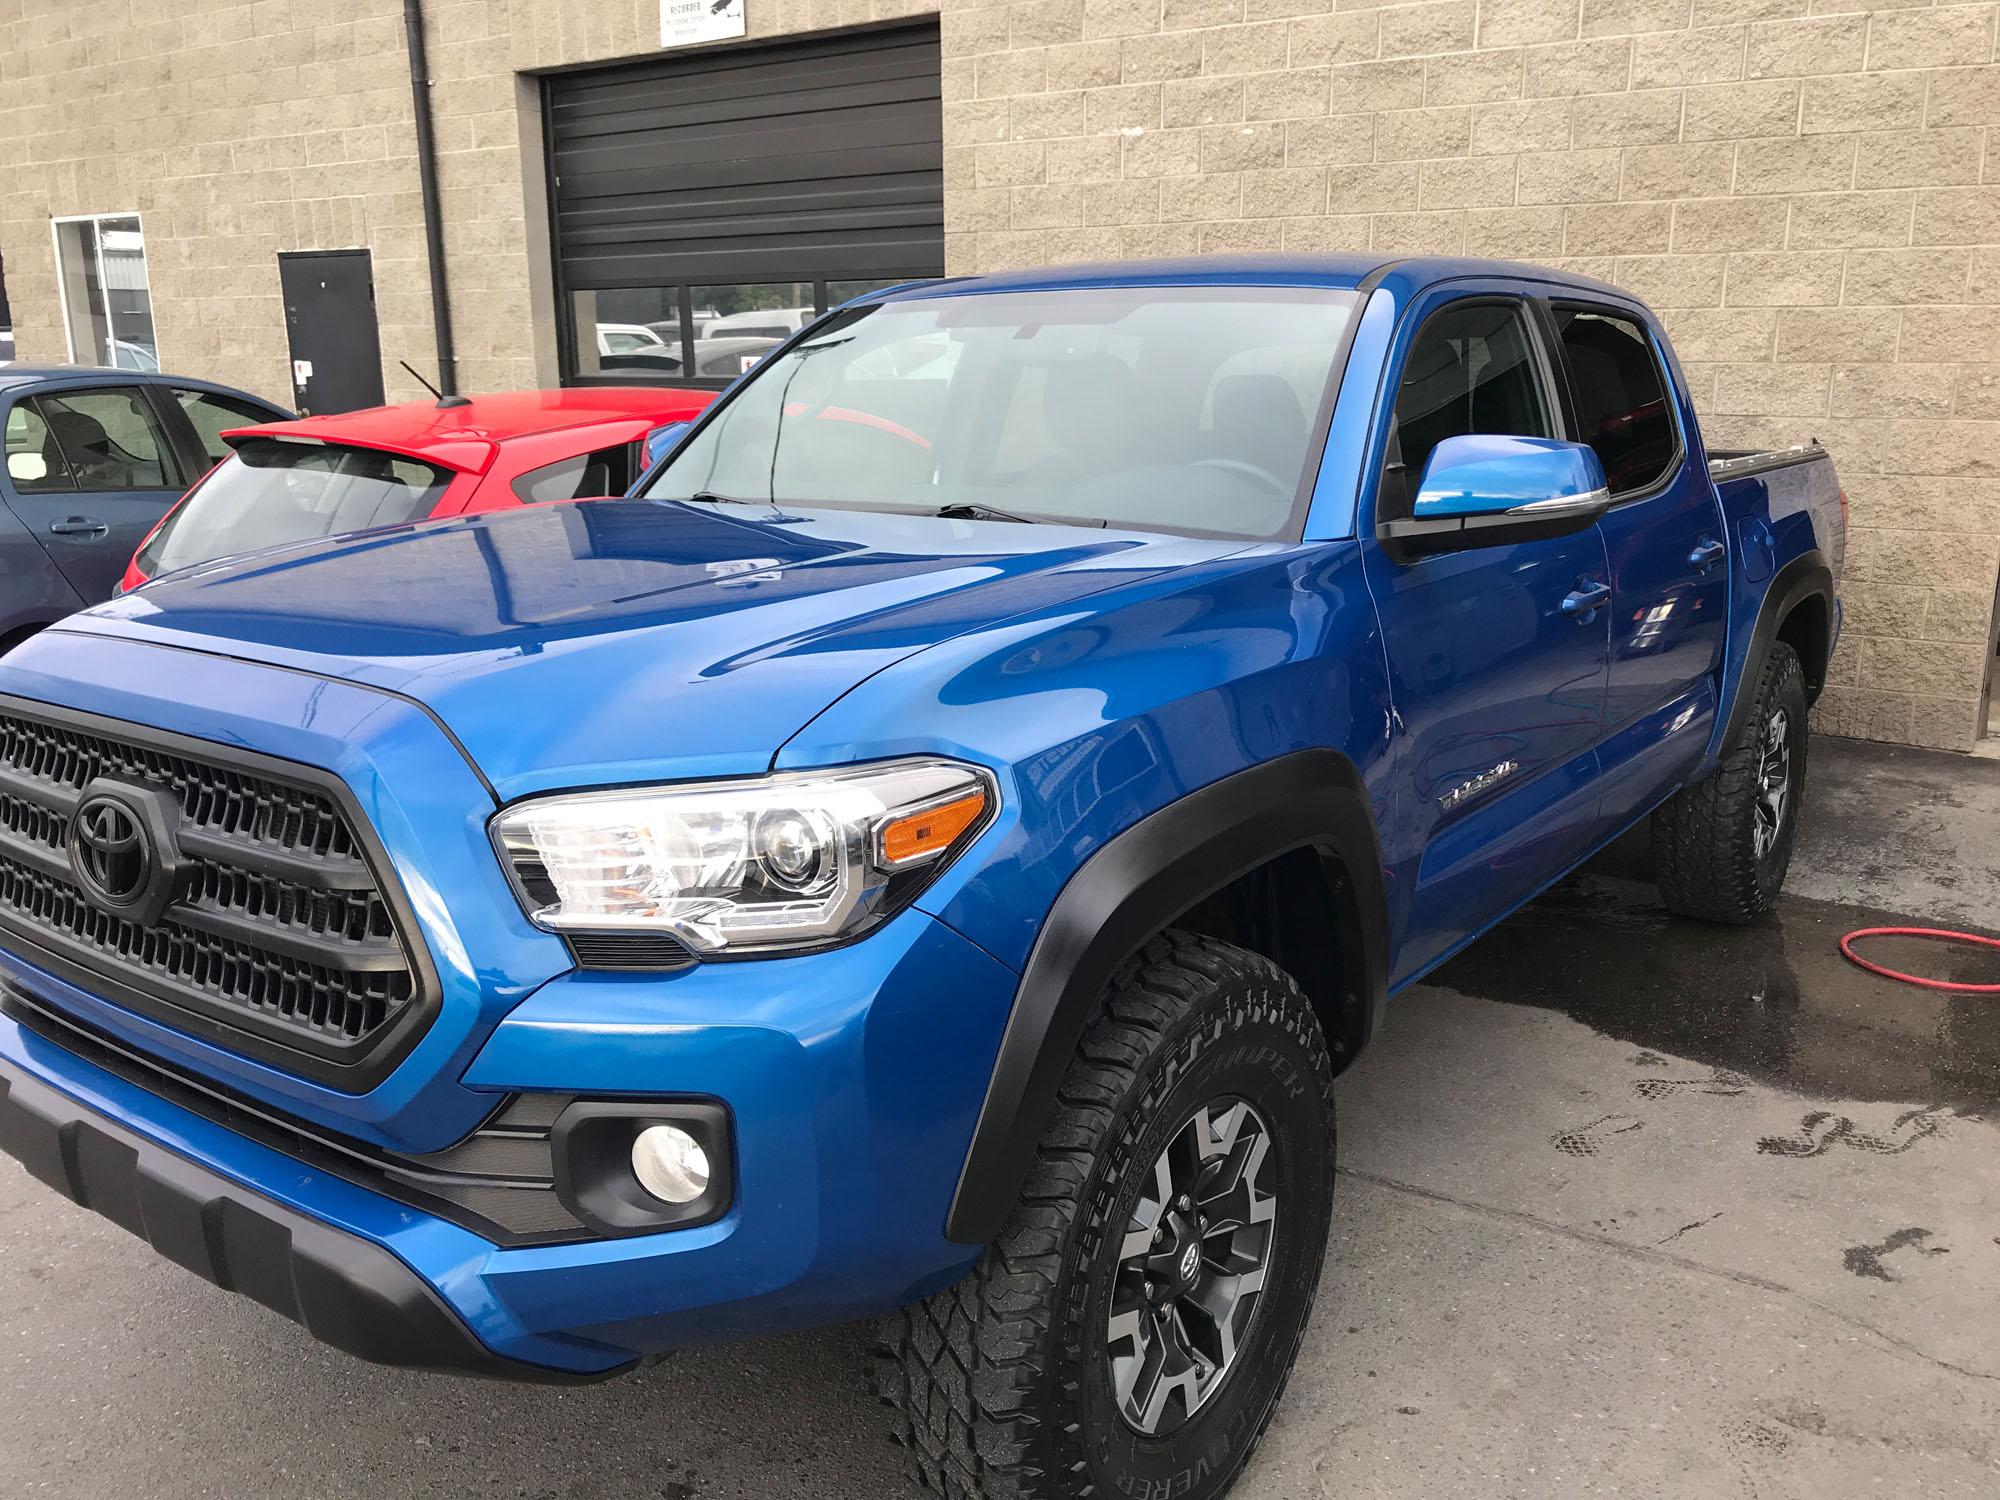 Toyota Tacoma Peter Gilbert Sept 19 2018 (1).jpg